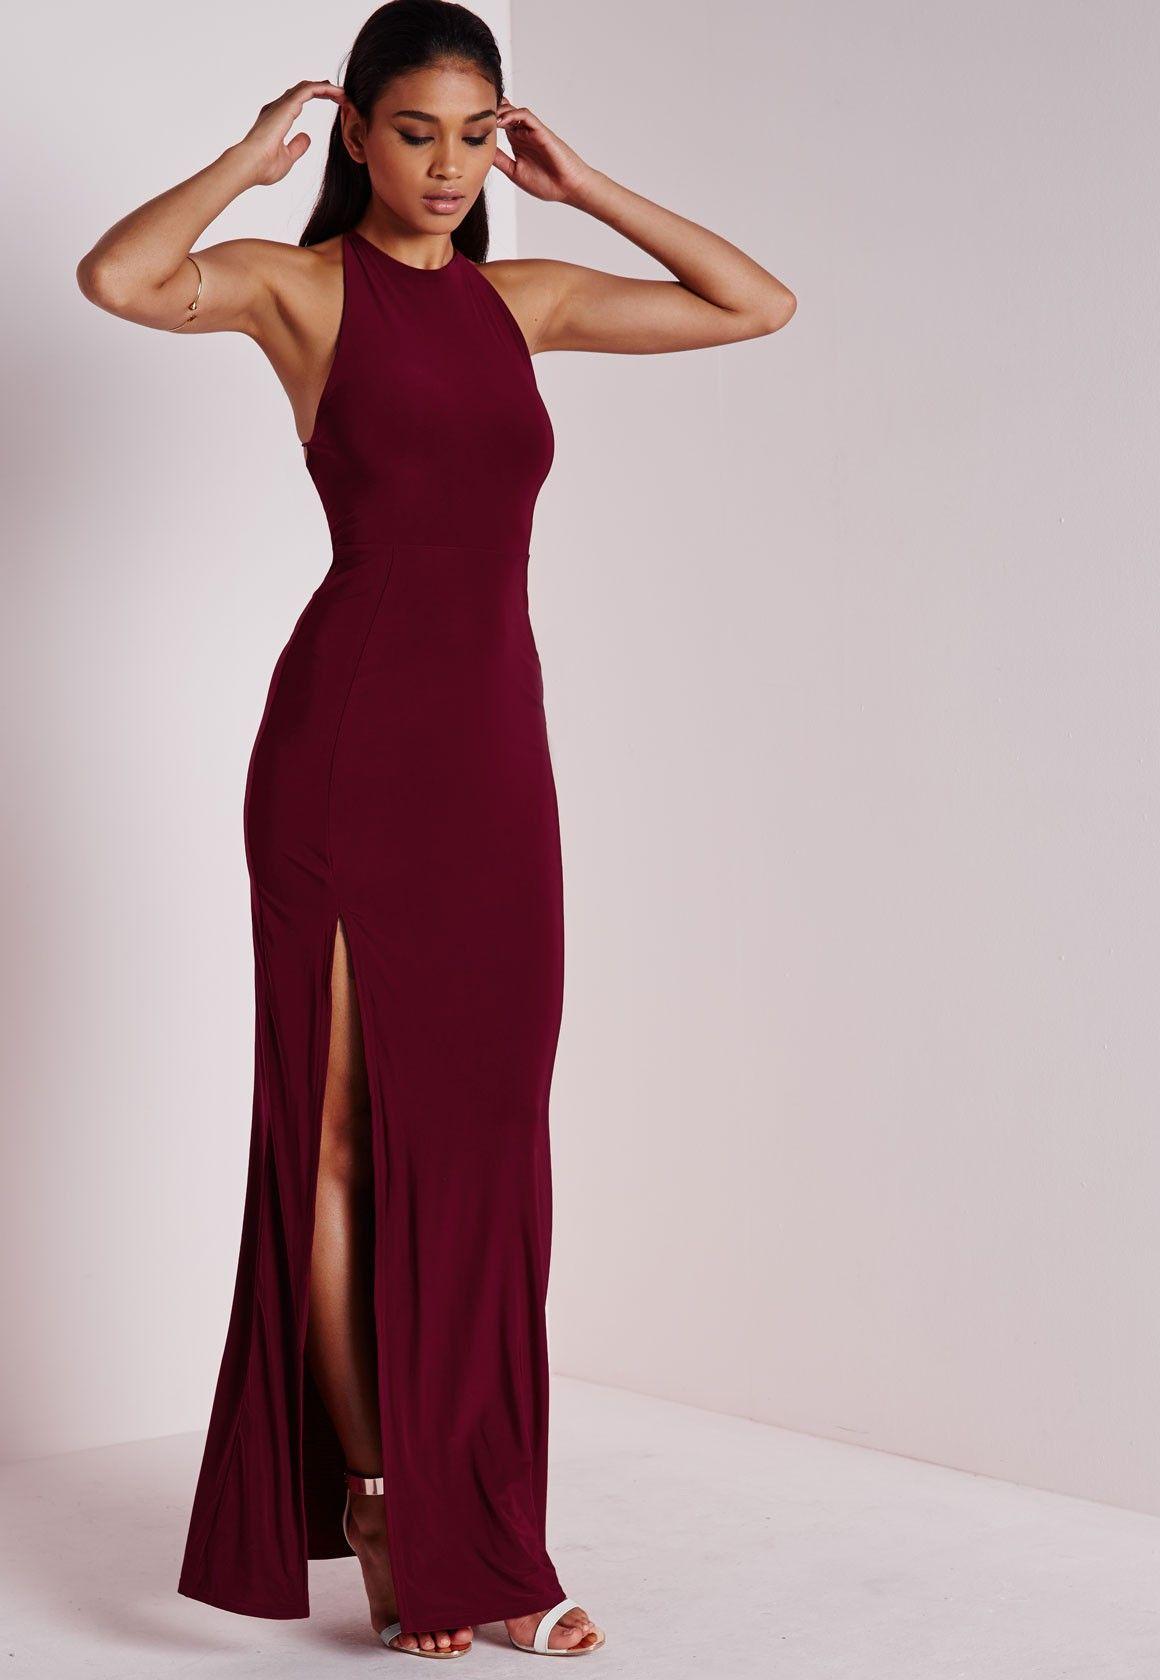 Slinky Side Split Maxi Dress Burgundy Dresses Maxi